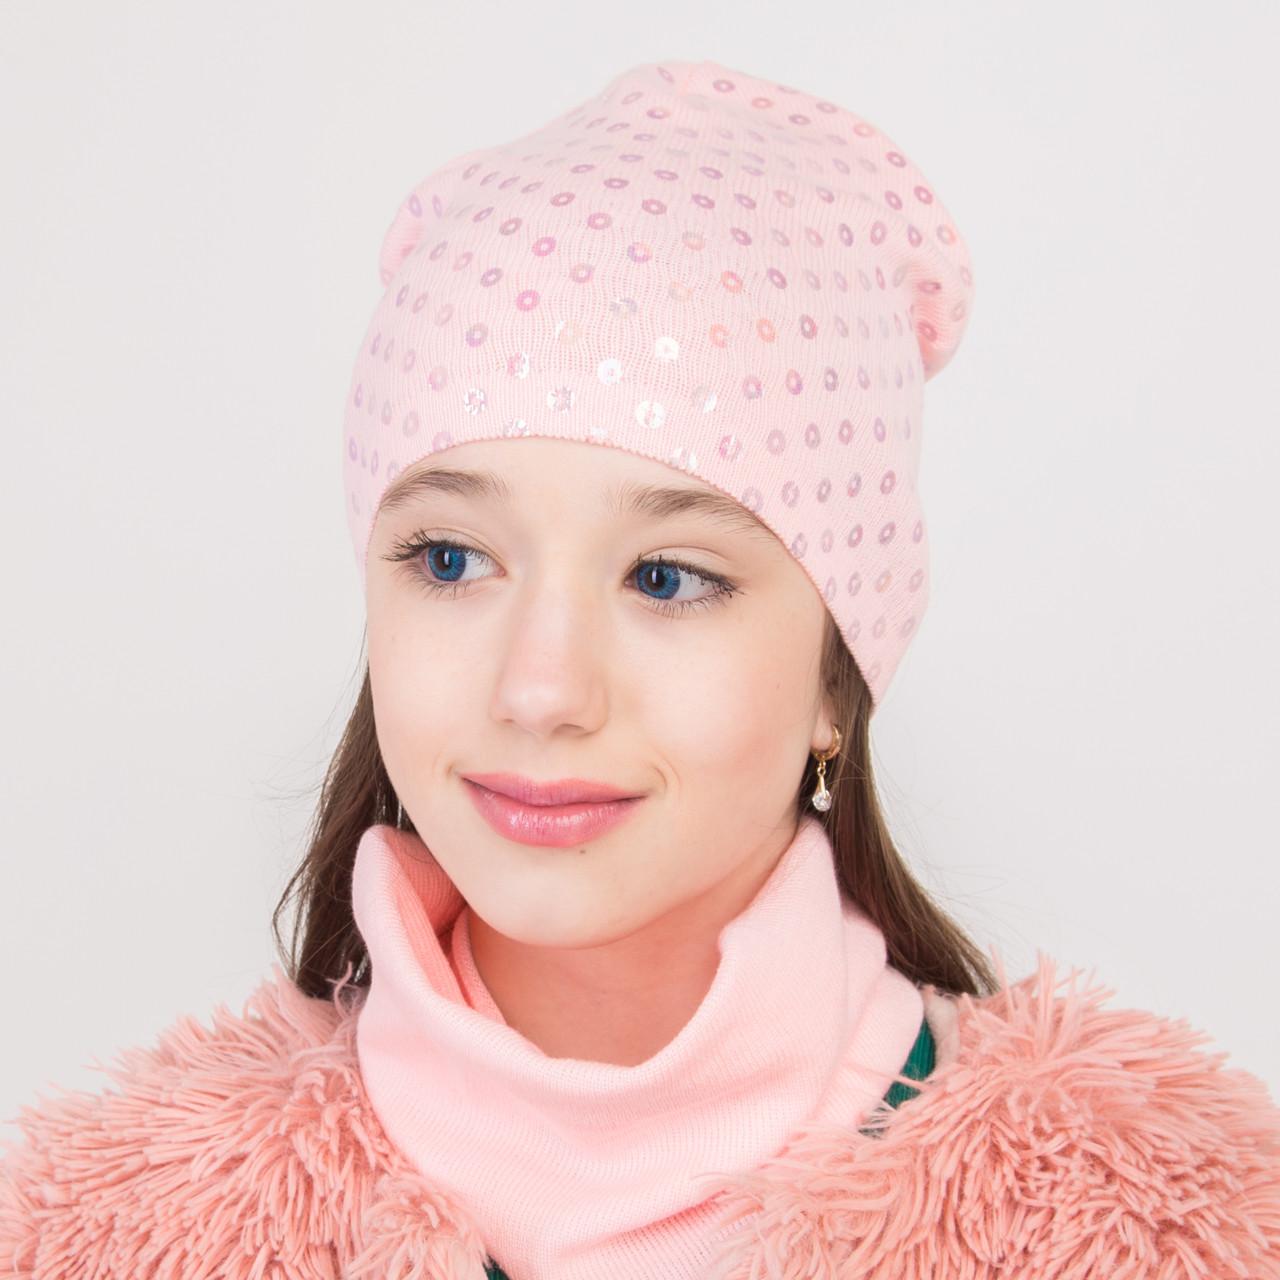 Весенний комплект с пайетками для девочки оптом - Артикул 2266